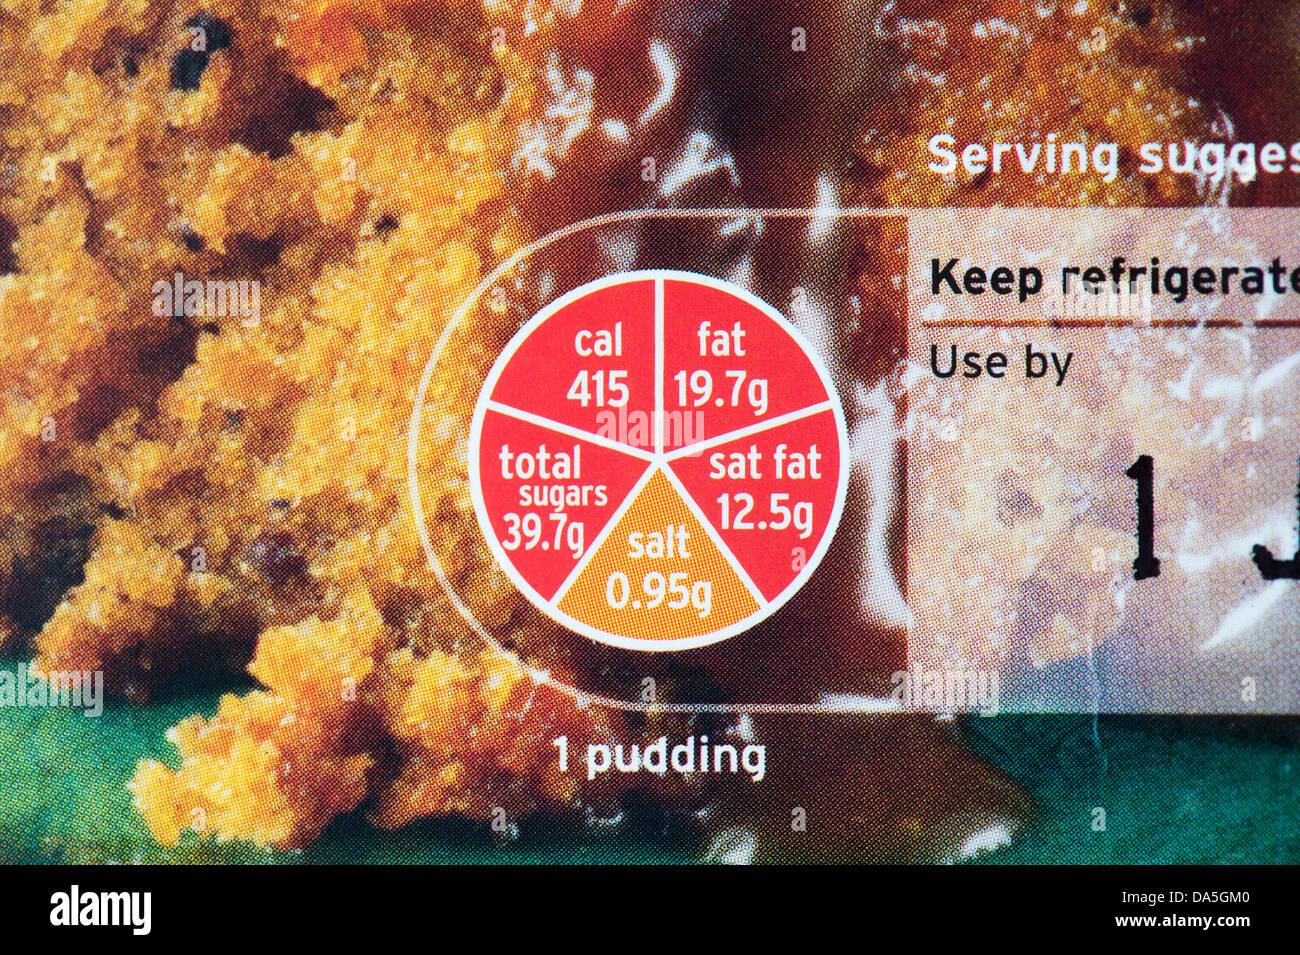 Sainsburys traffic light labelling on food packaging - Stock Image